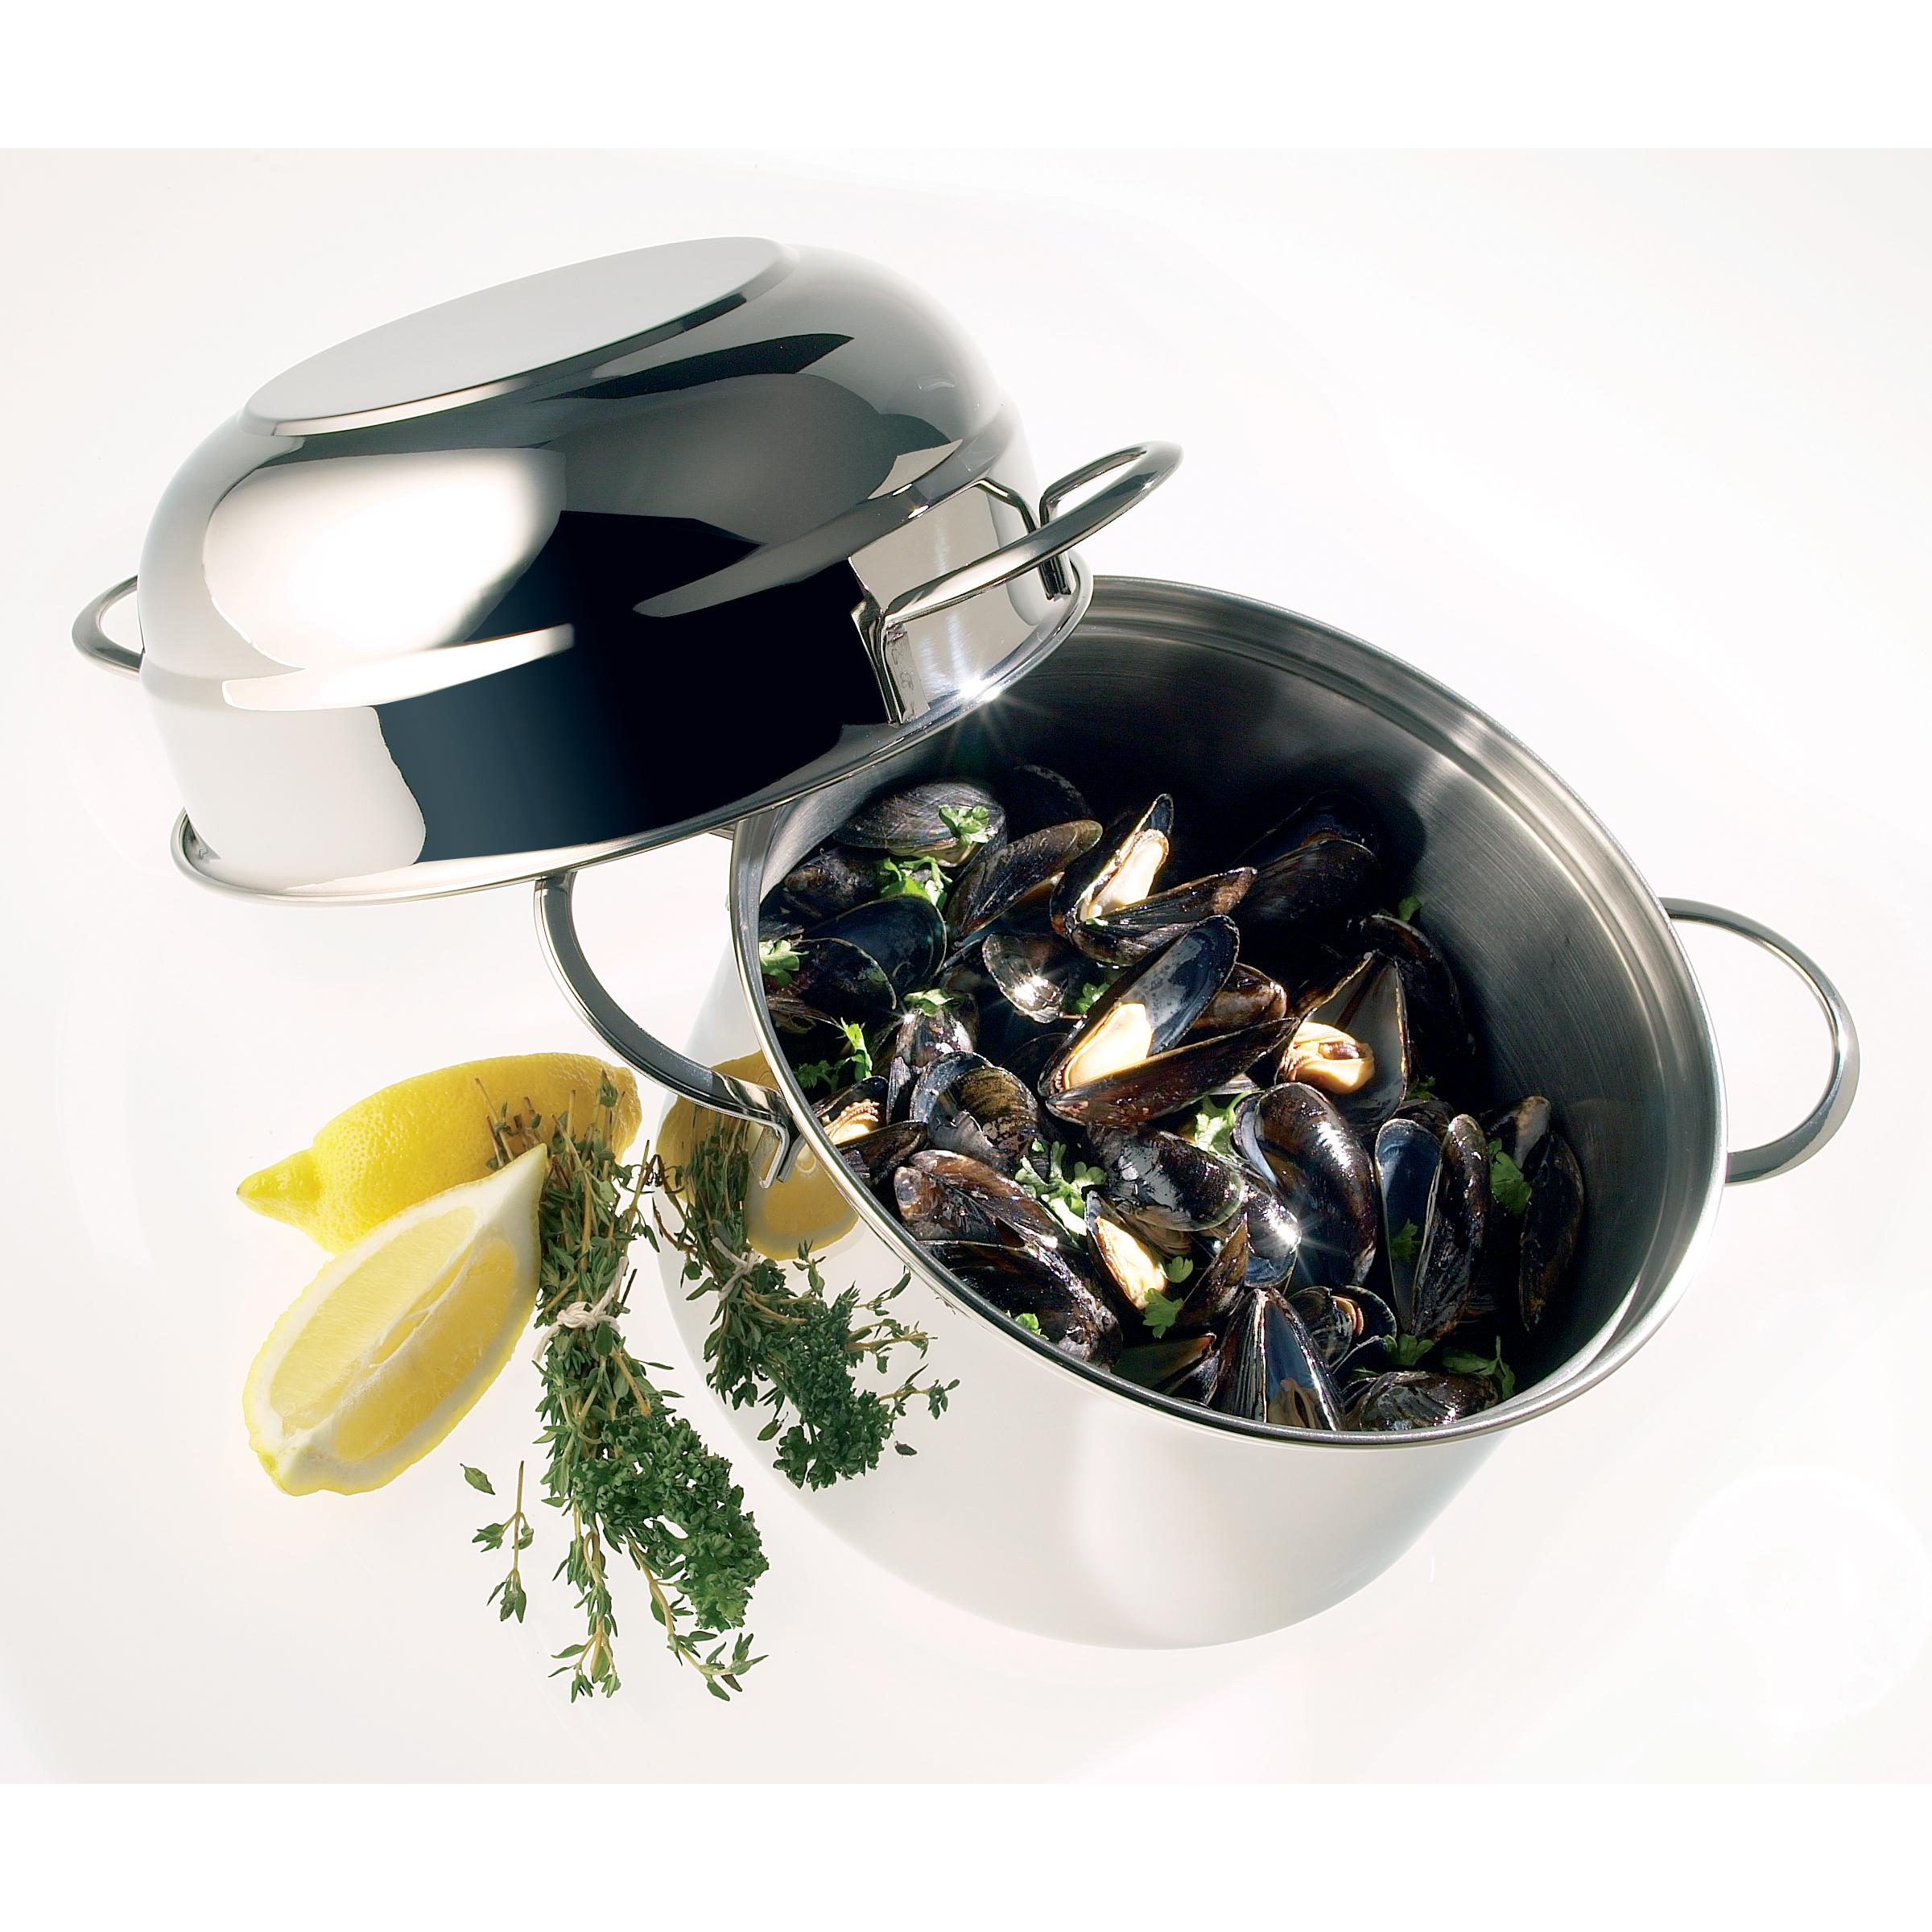 Demeyere Resto Mussel Pot, 3.2 Quart